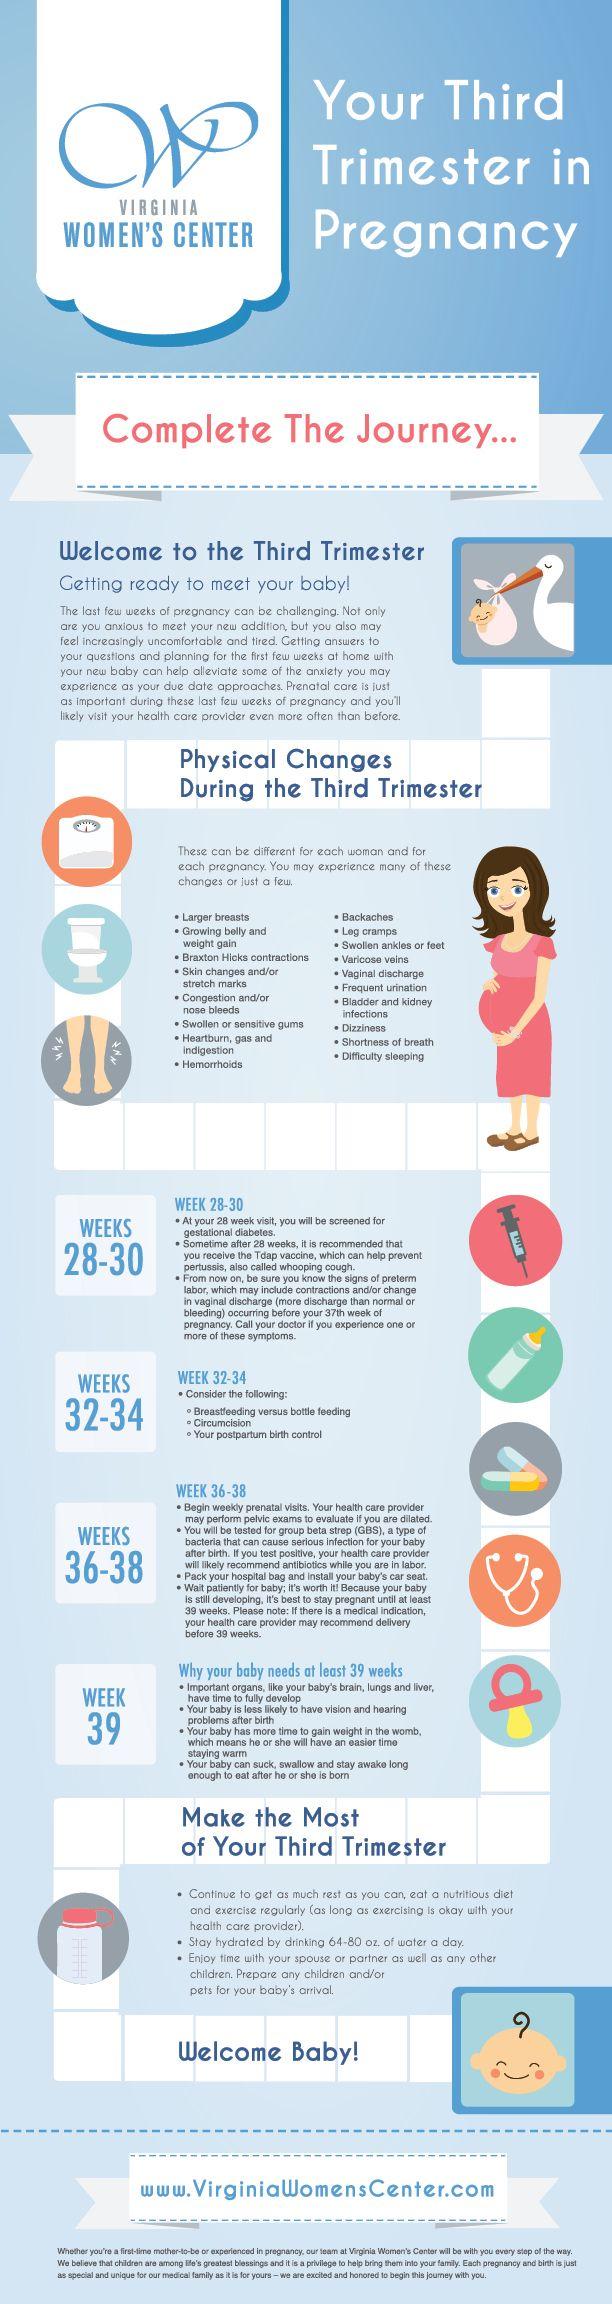 Your Third Trimester in Pregnancy | Virginia Women's Center Blog